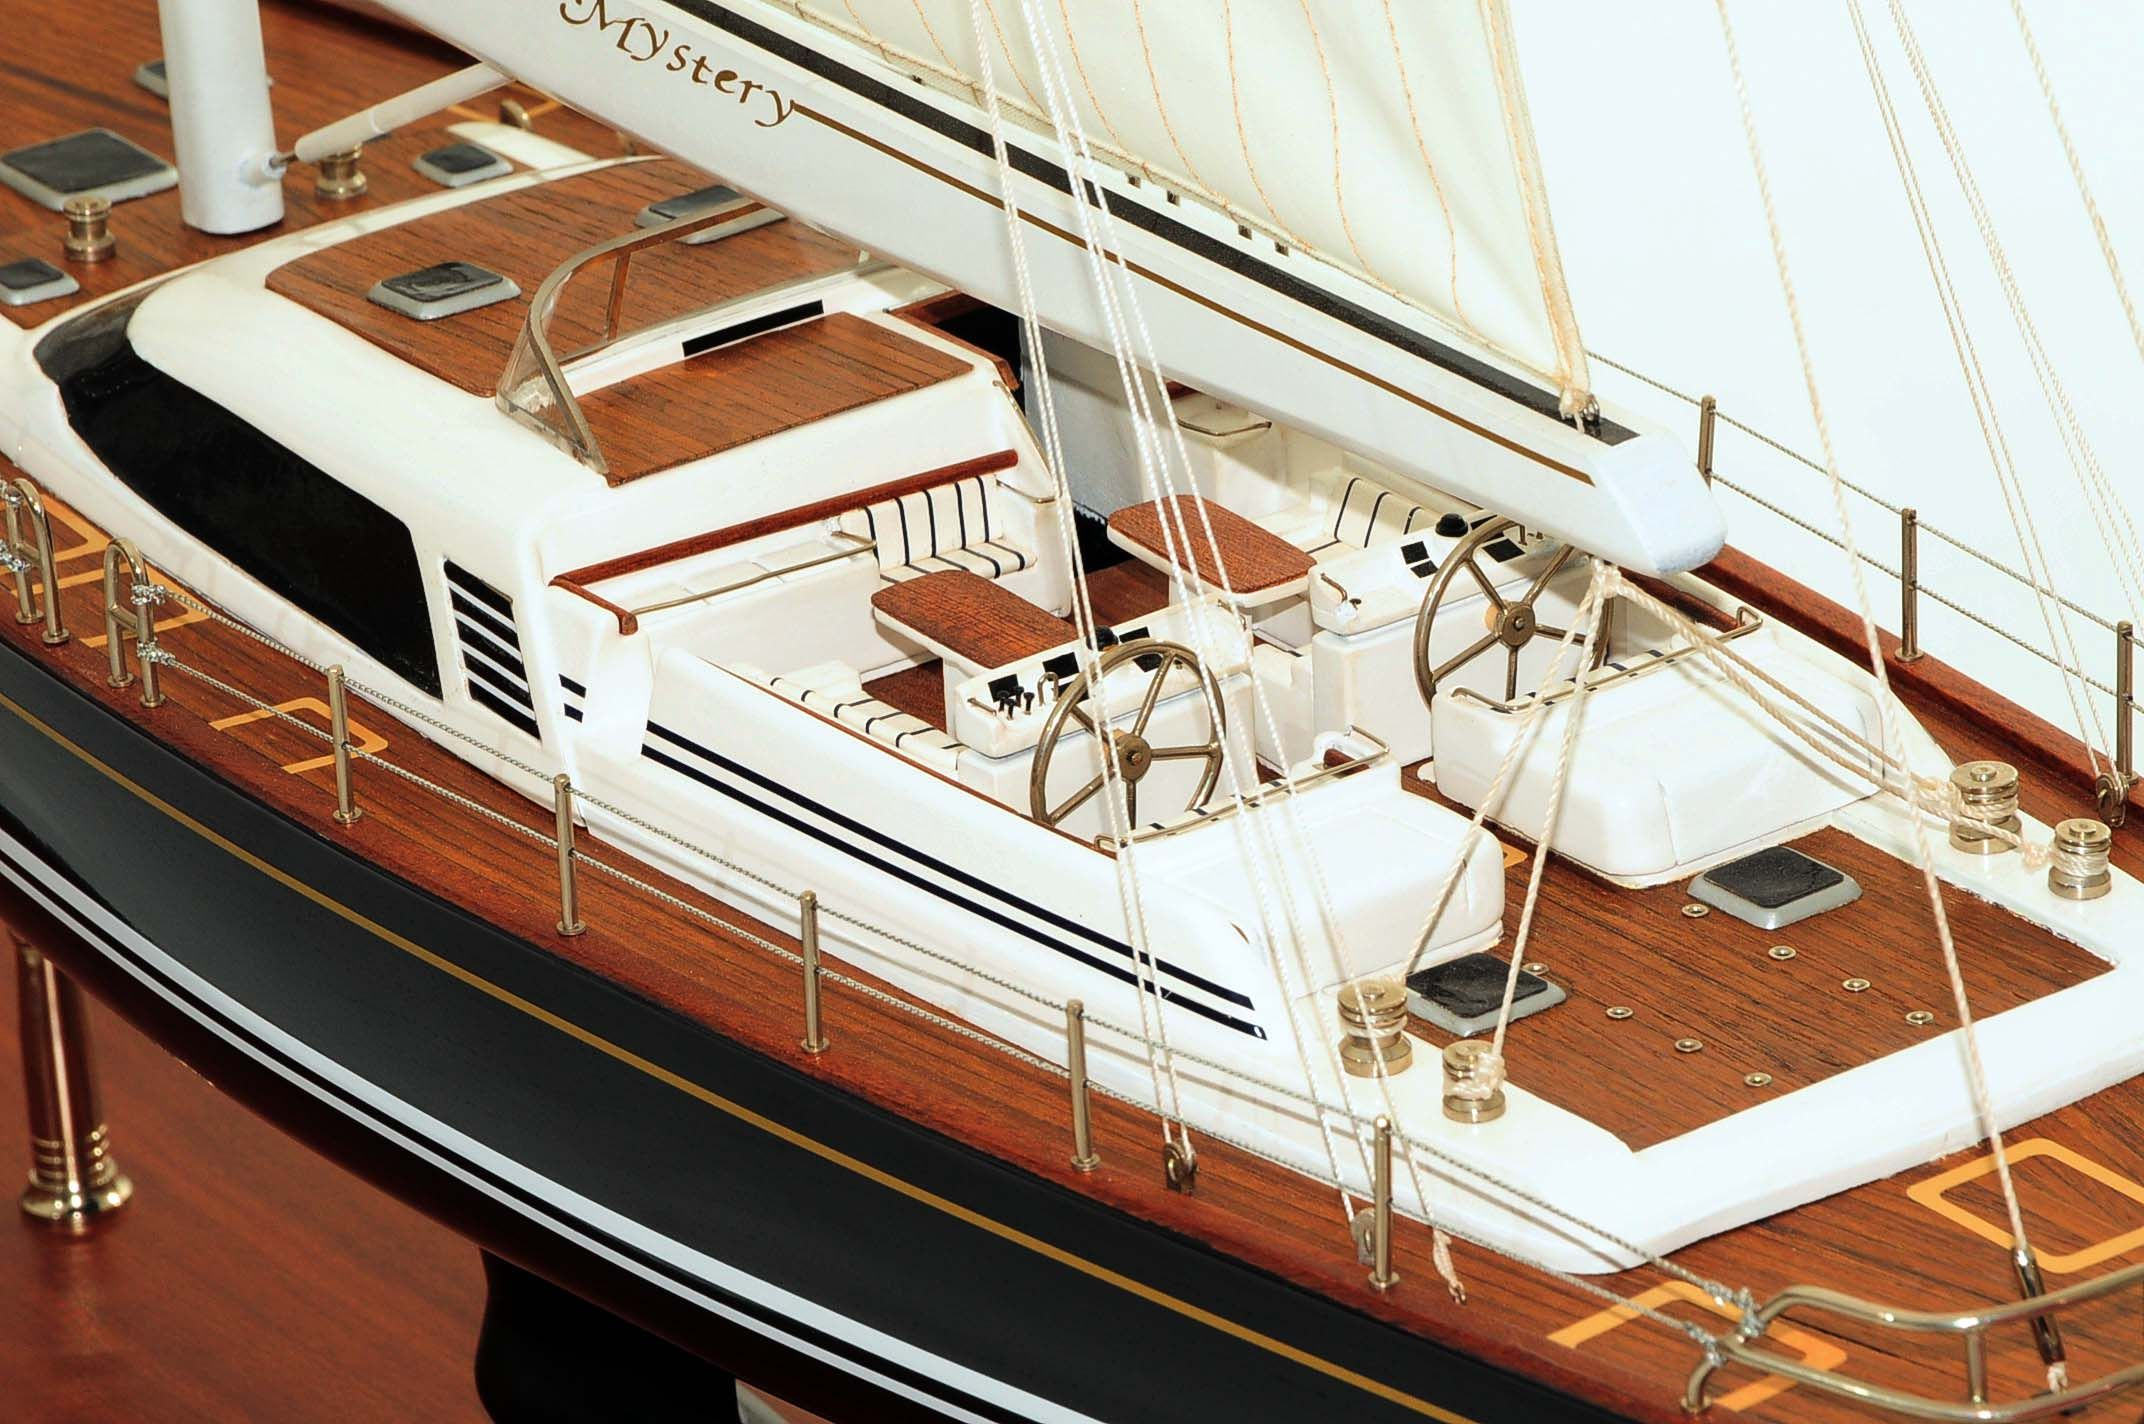 709-6074-Mystery-Model-Yacht